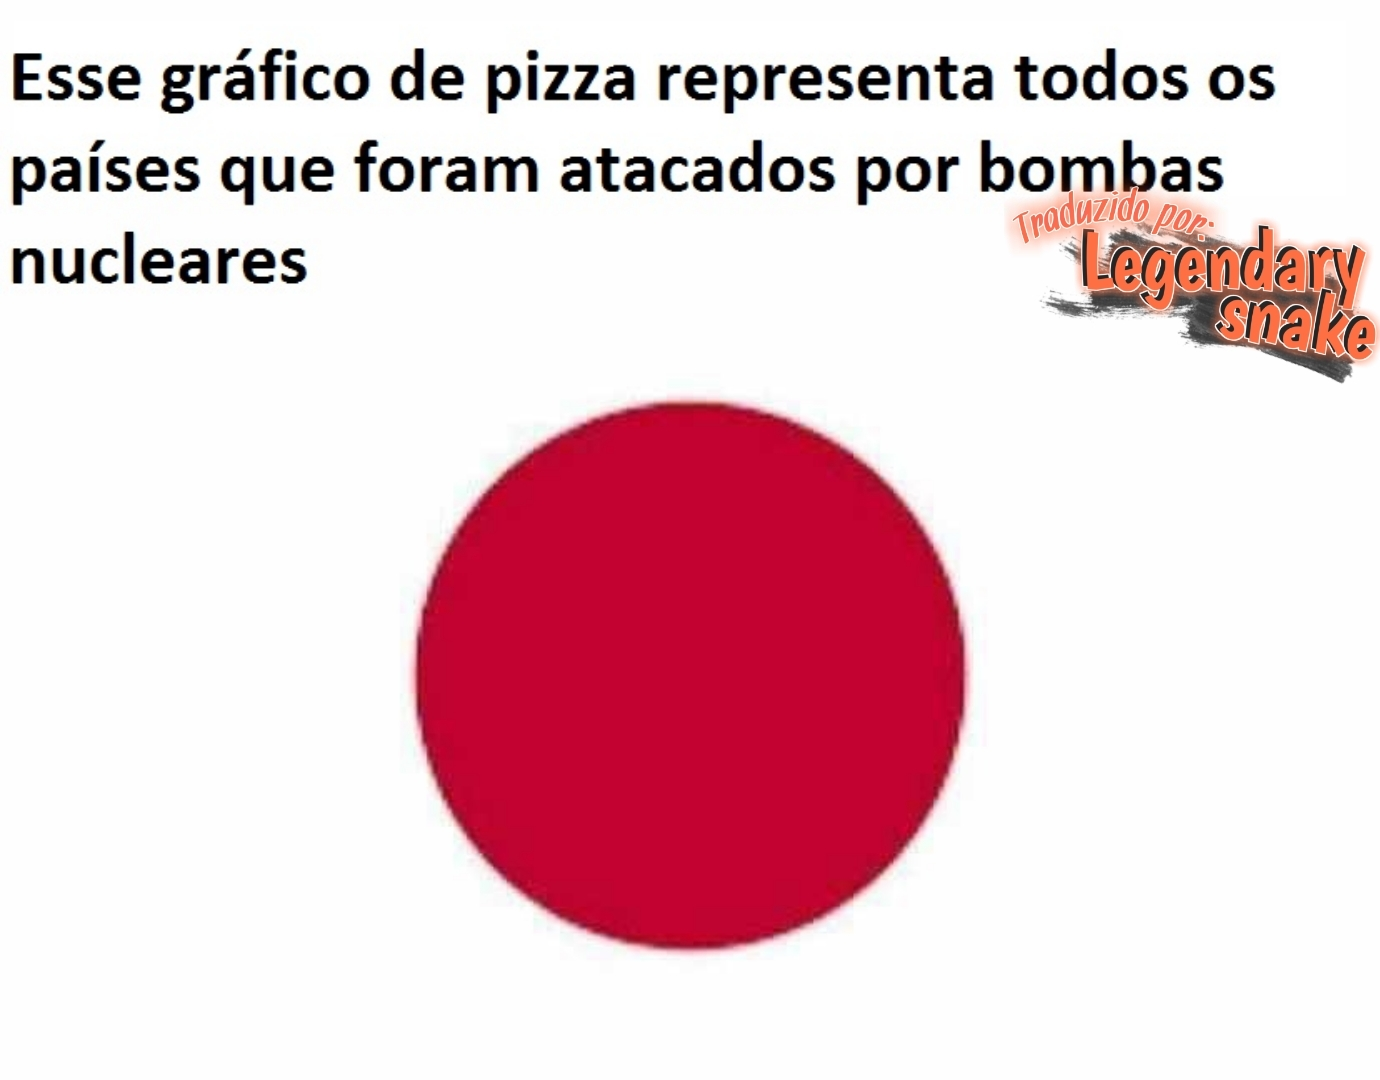 Japão - meme